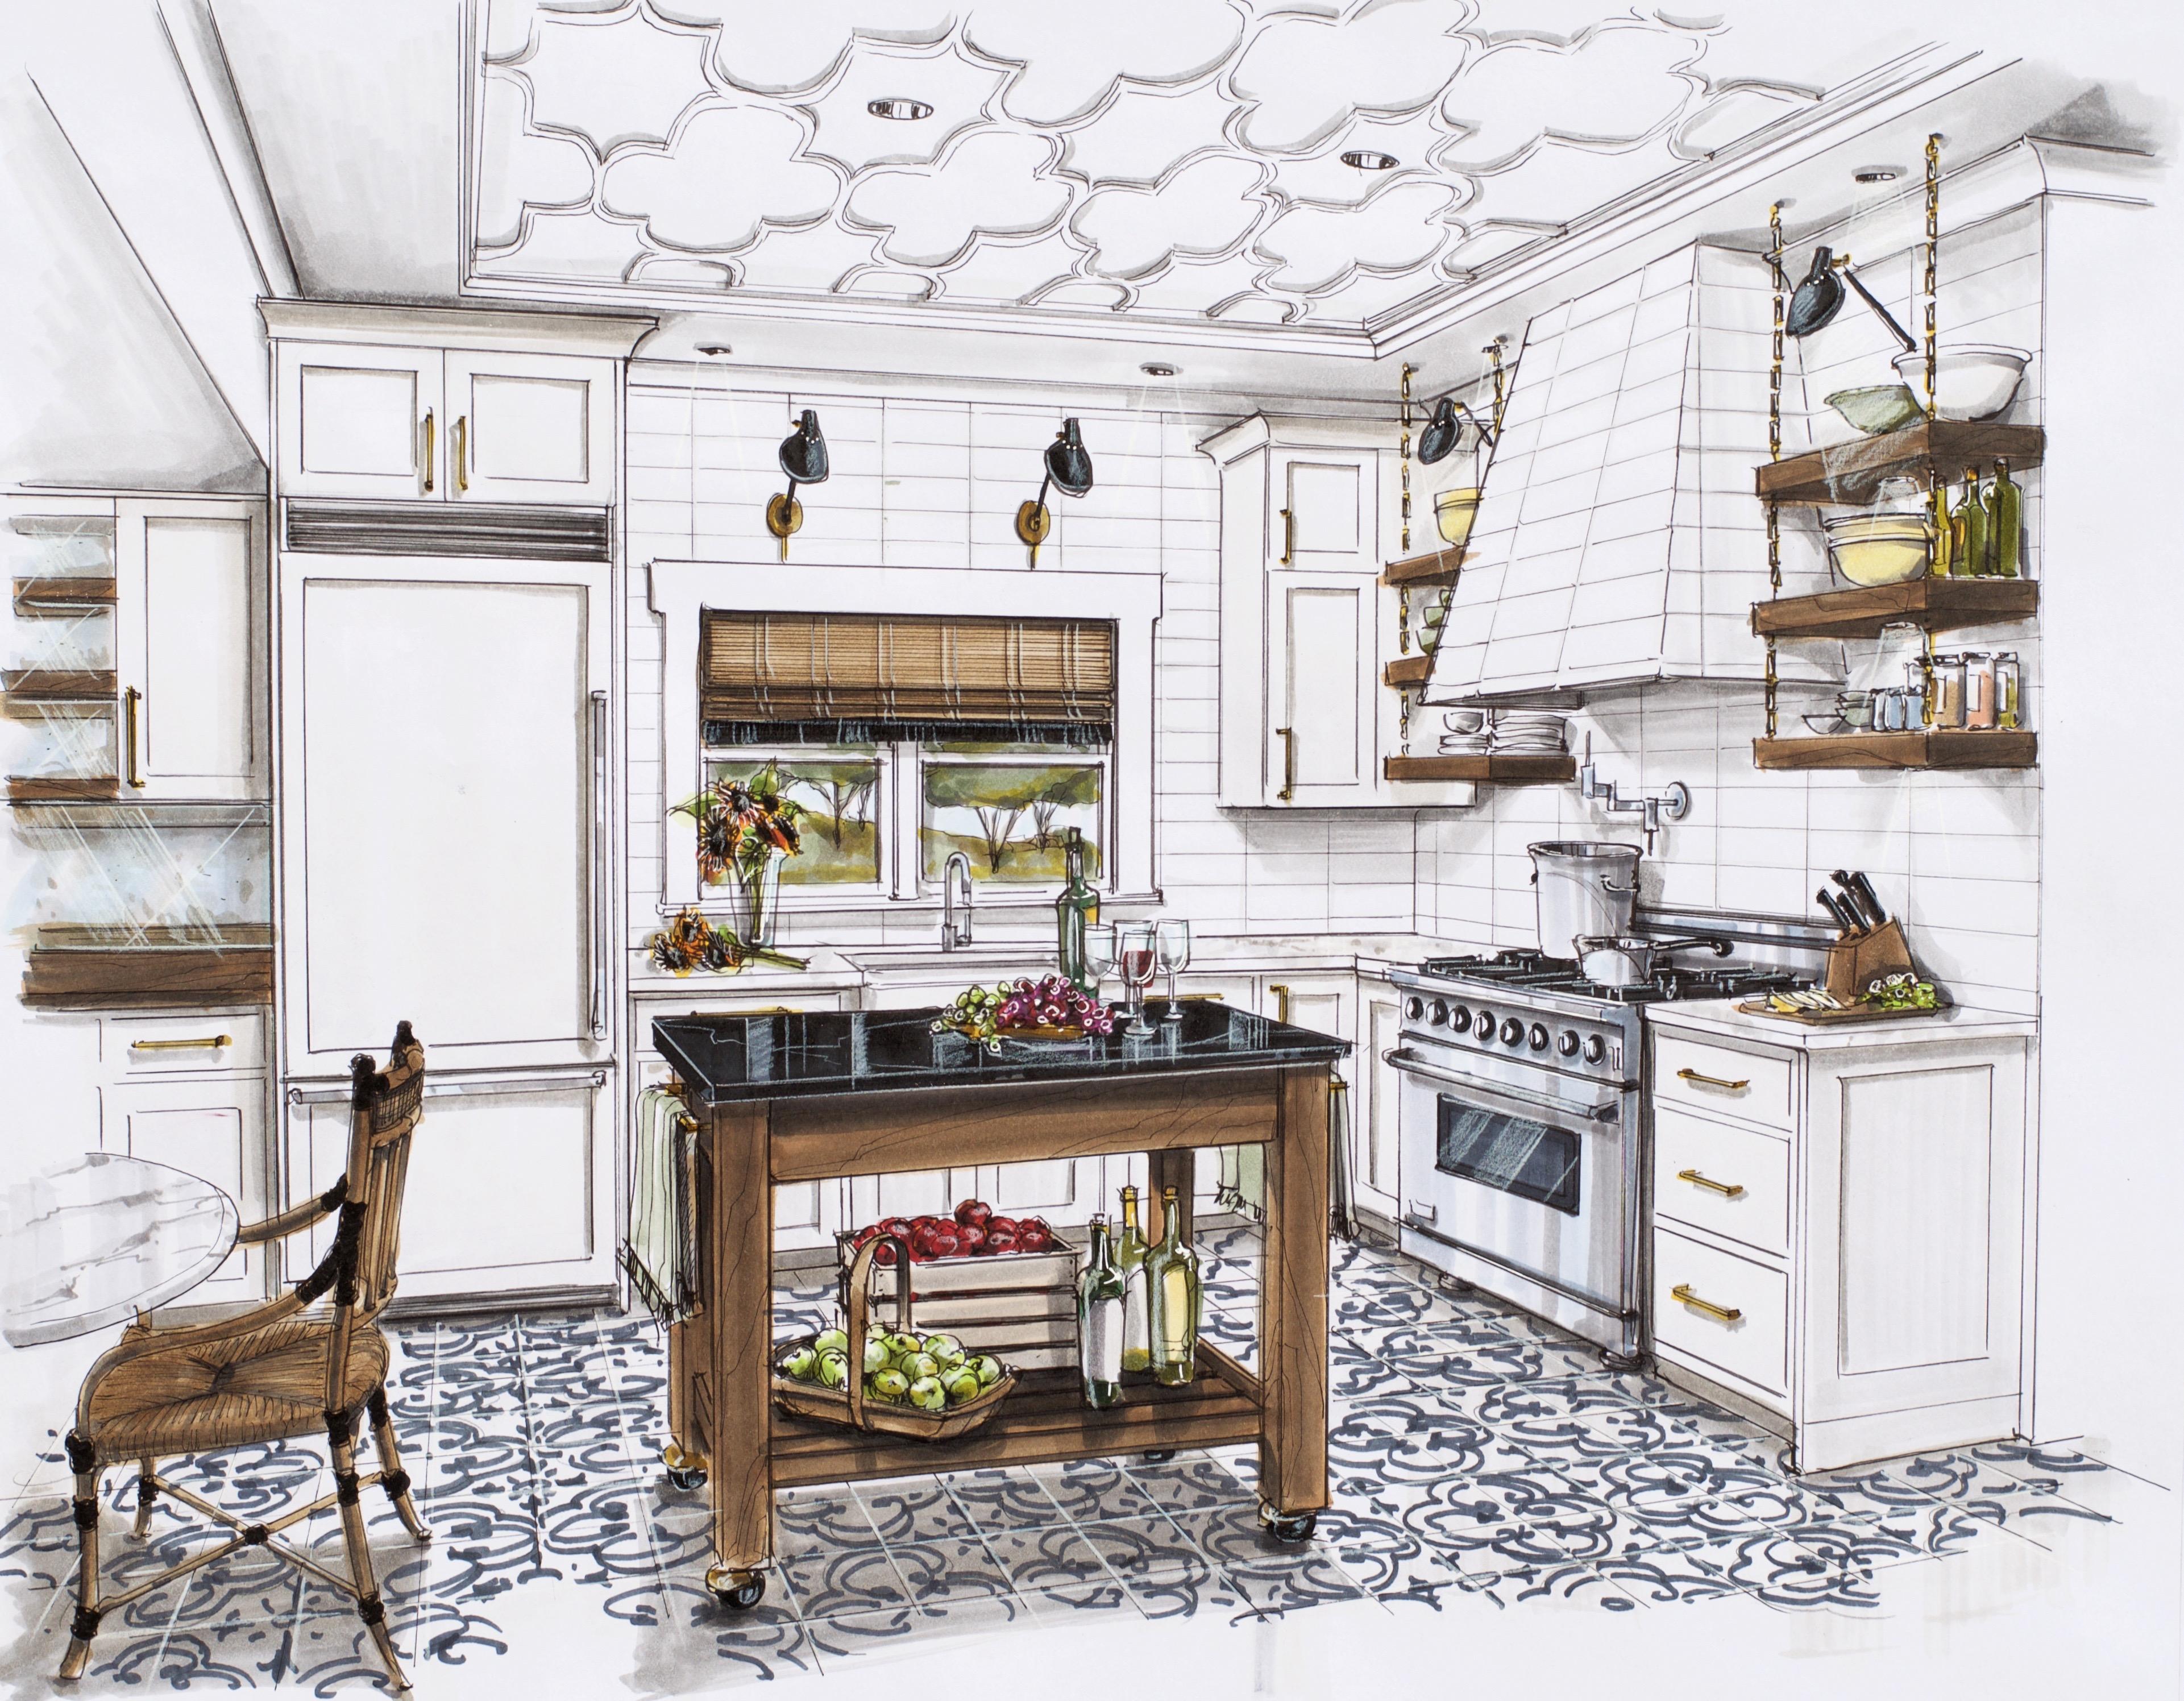 Stylish, Affordable Kitchens - Medallion Cabinetry - Kitchen Design ...